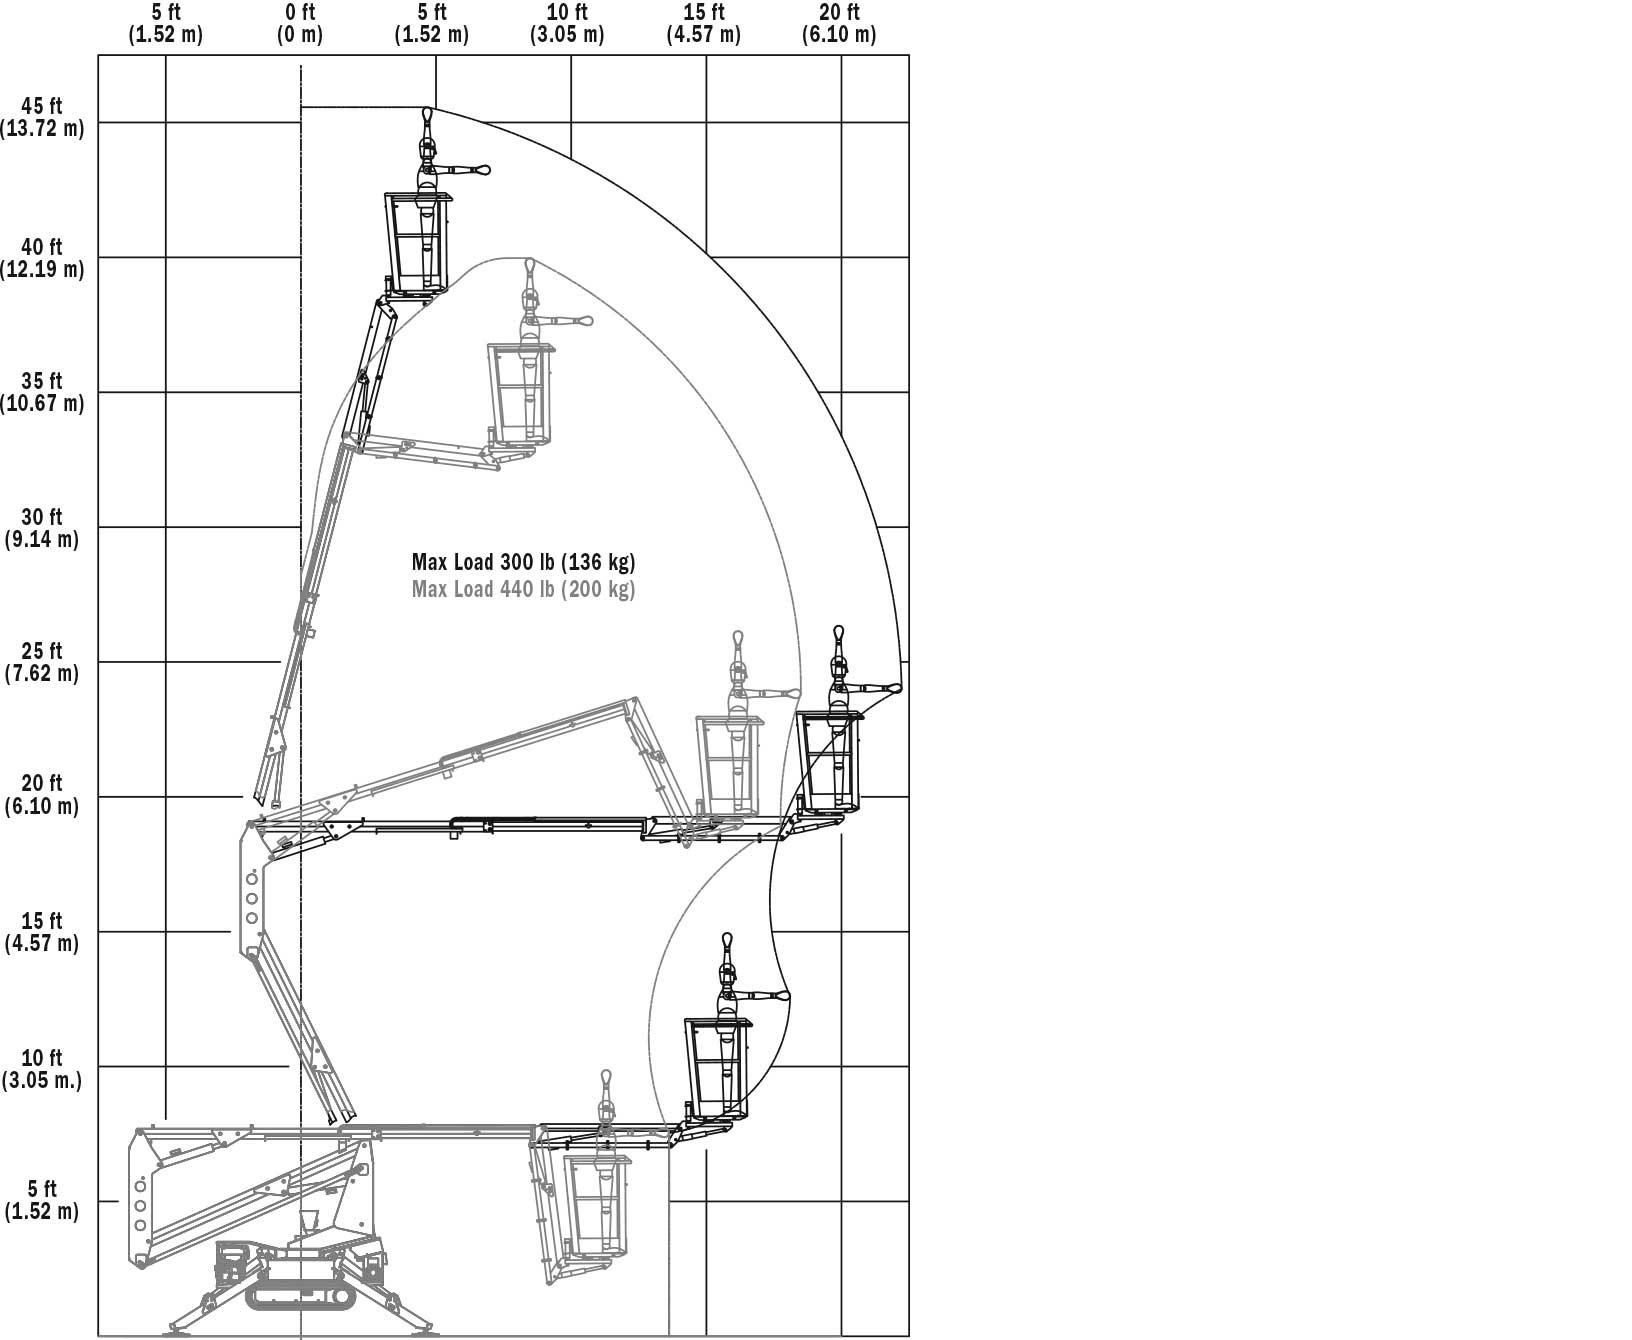 21 Inspirational Upright Mx19 Scissor Lift Wiring Diagram